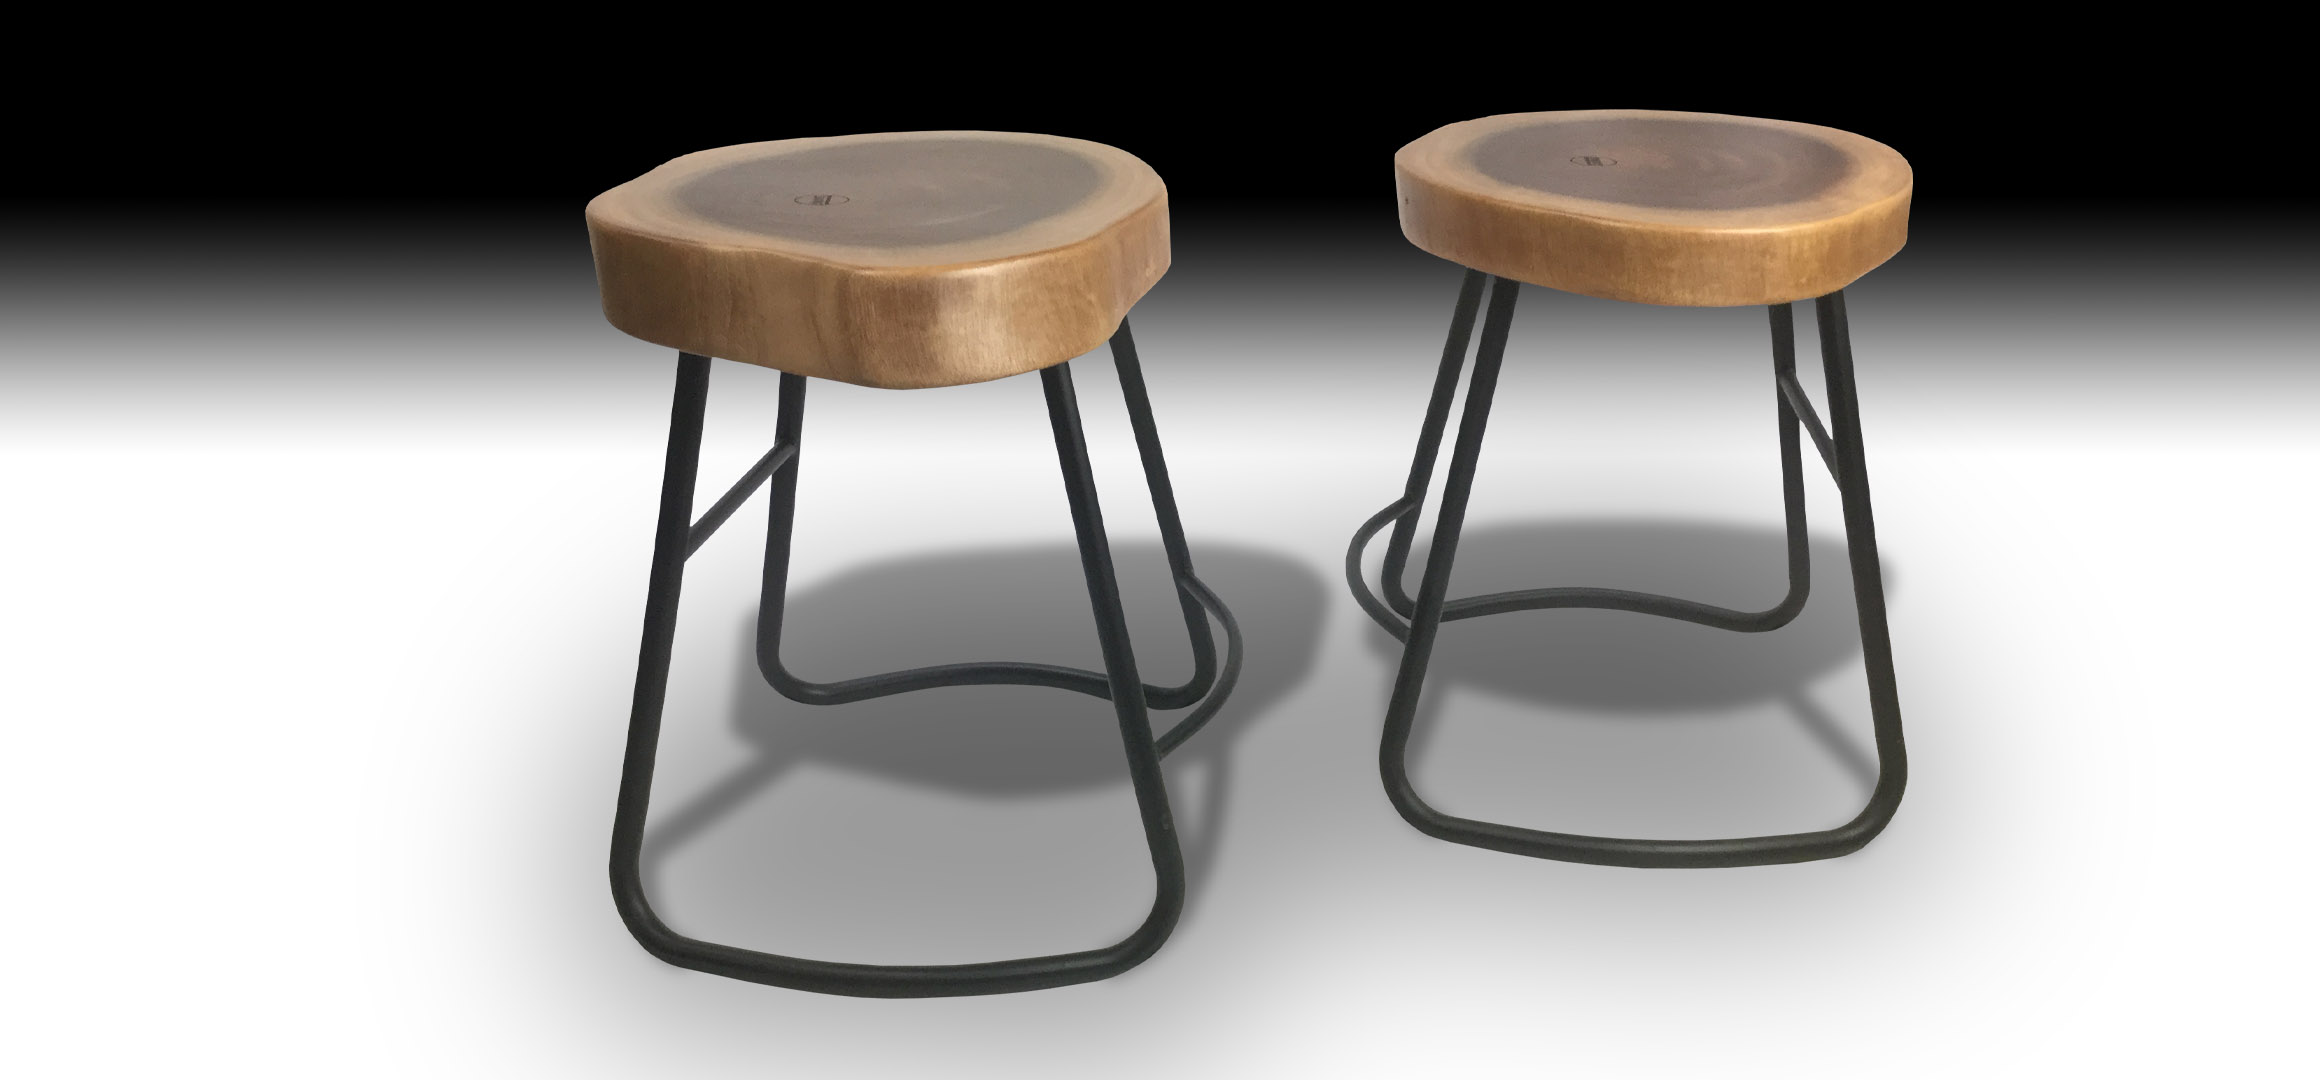 Two Julian Suar wood stools